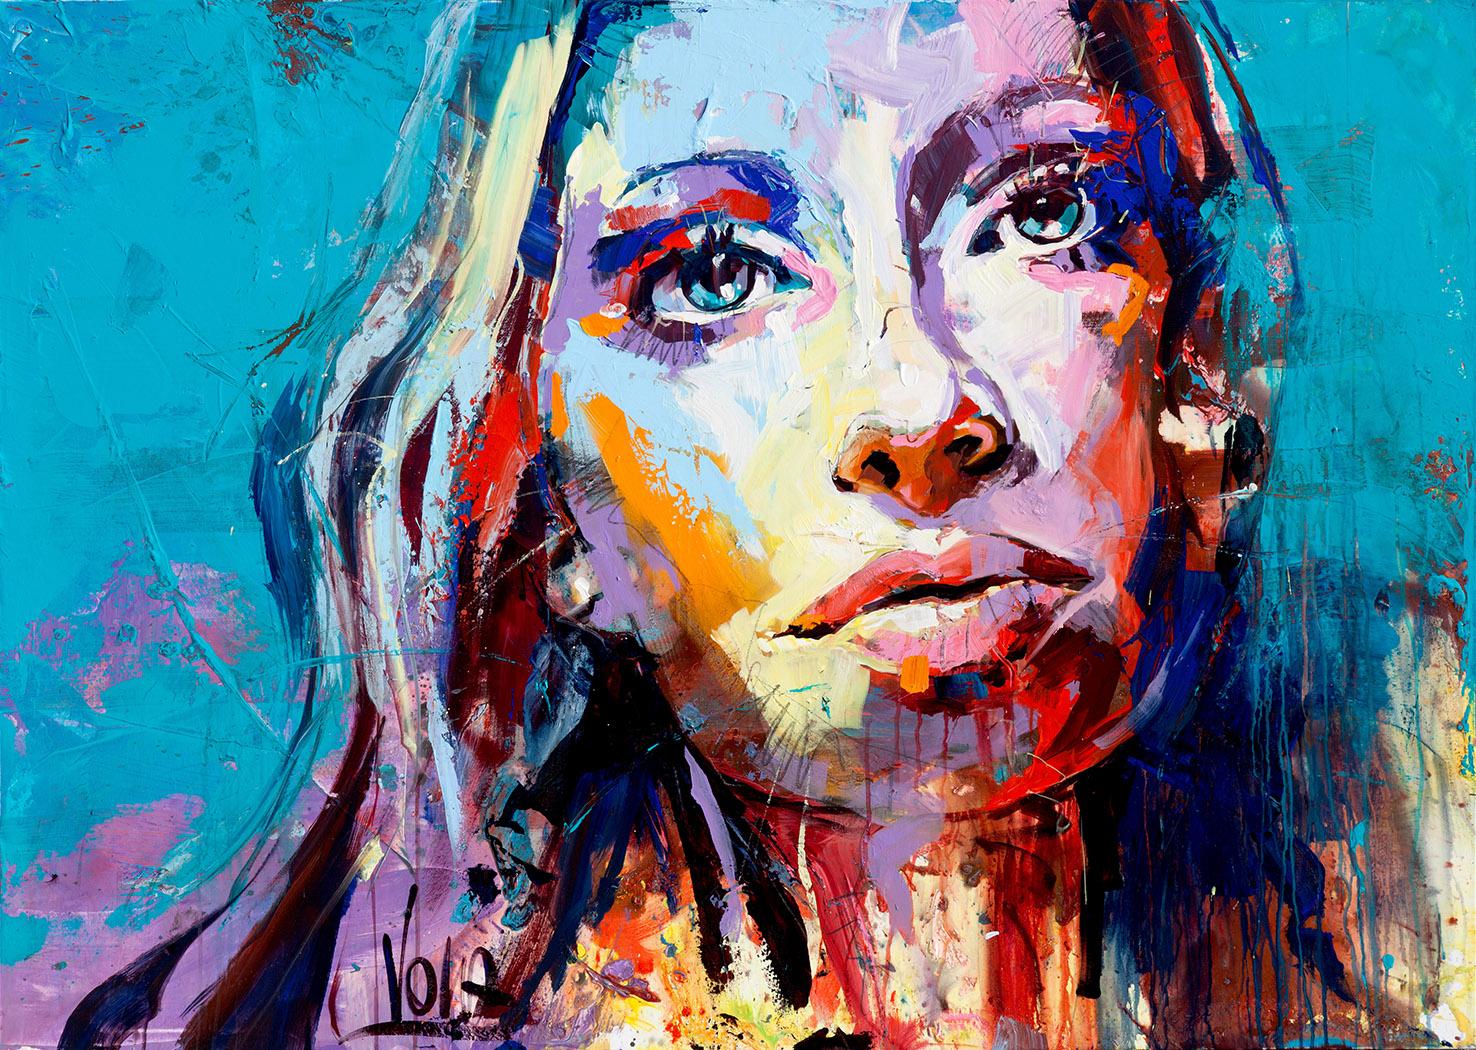 Head, 100x140 cm/39,4x56,1 inch, Acrylic on Canvas